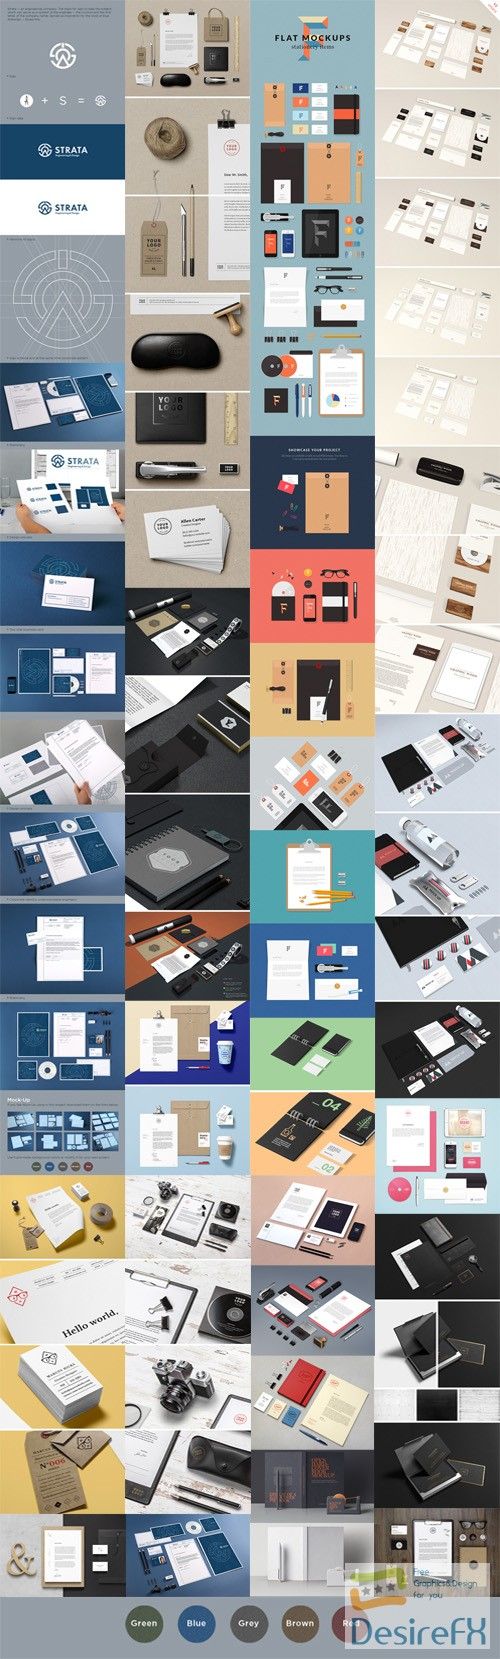 mock-up - Corporate [Stationery/Branding/Identity] PSD Mockups Collection